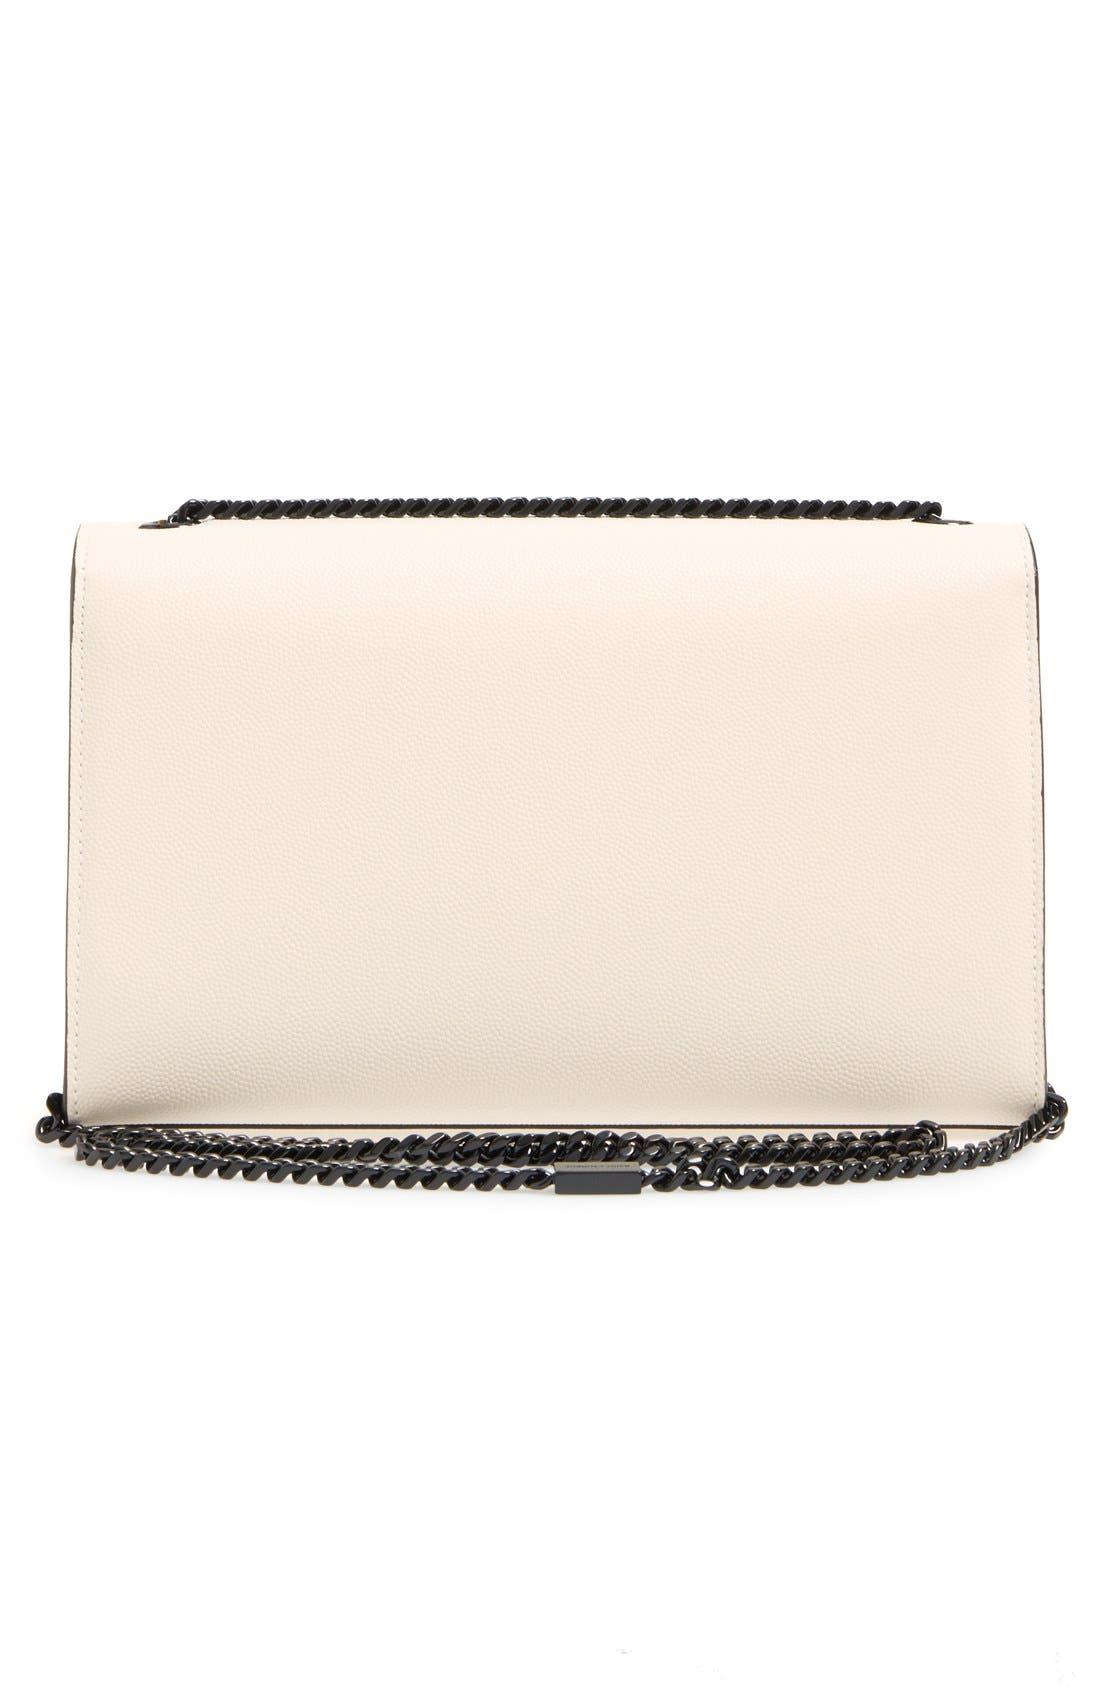 Alternate Image 2  - Saint Laurent 'Medium Kate' Calfskin Leather Crossbody Bag